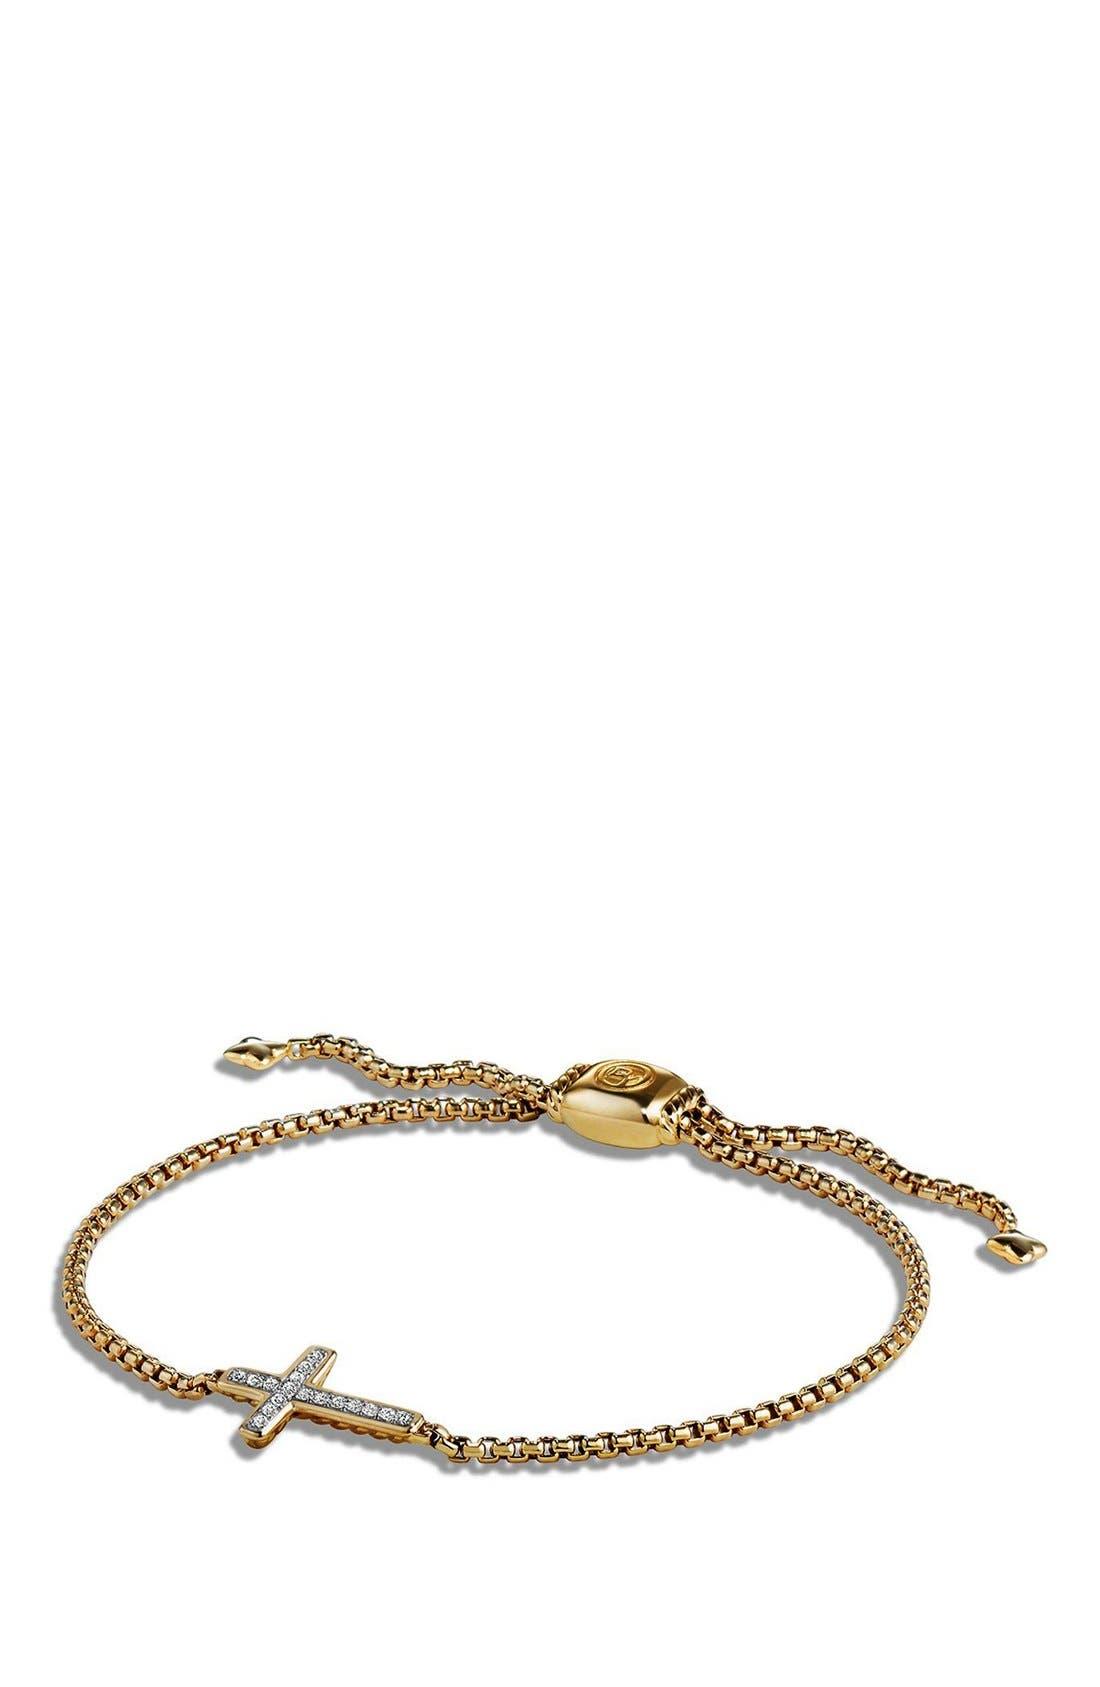 david yurman u0027petite pavu0027 cross bracelet with diamonds in 18k gold